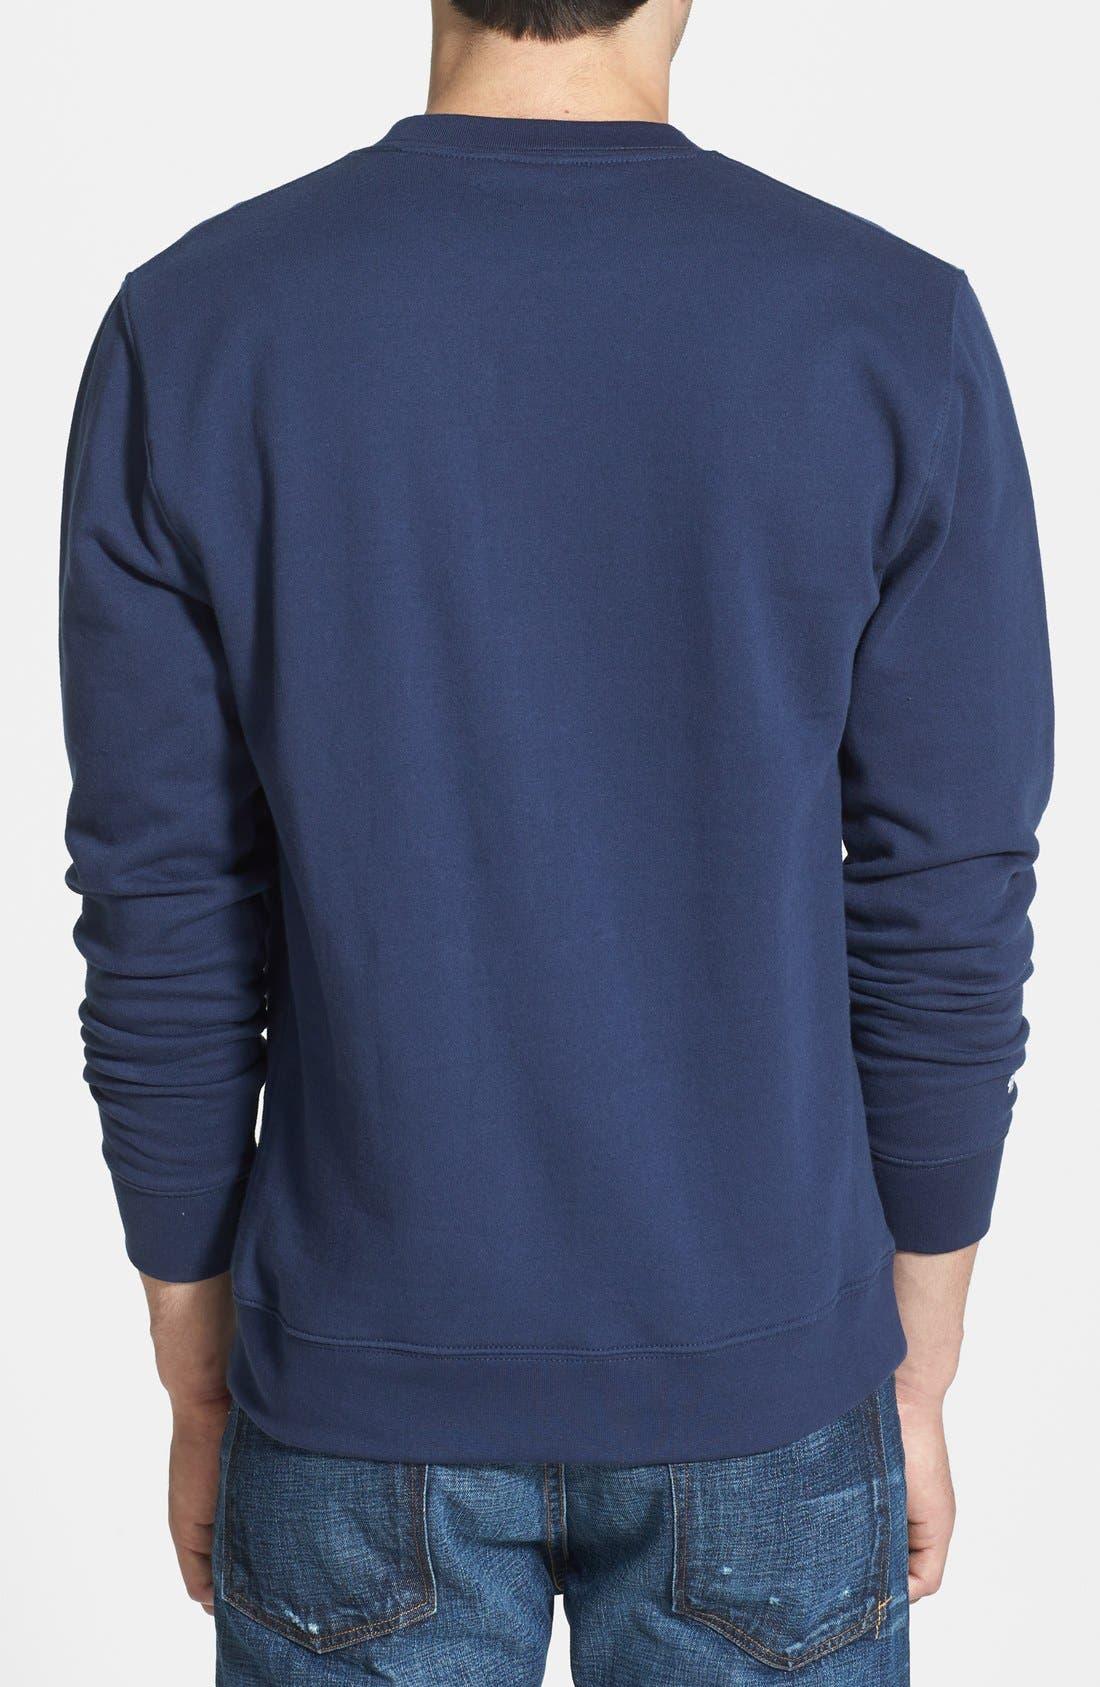 Alternate Image 2  - Mitchell & Ness 'Detroit Tigers' Crewneck Sweatshirt